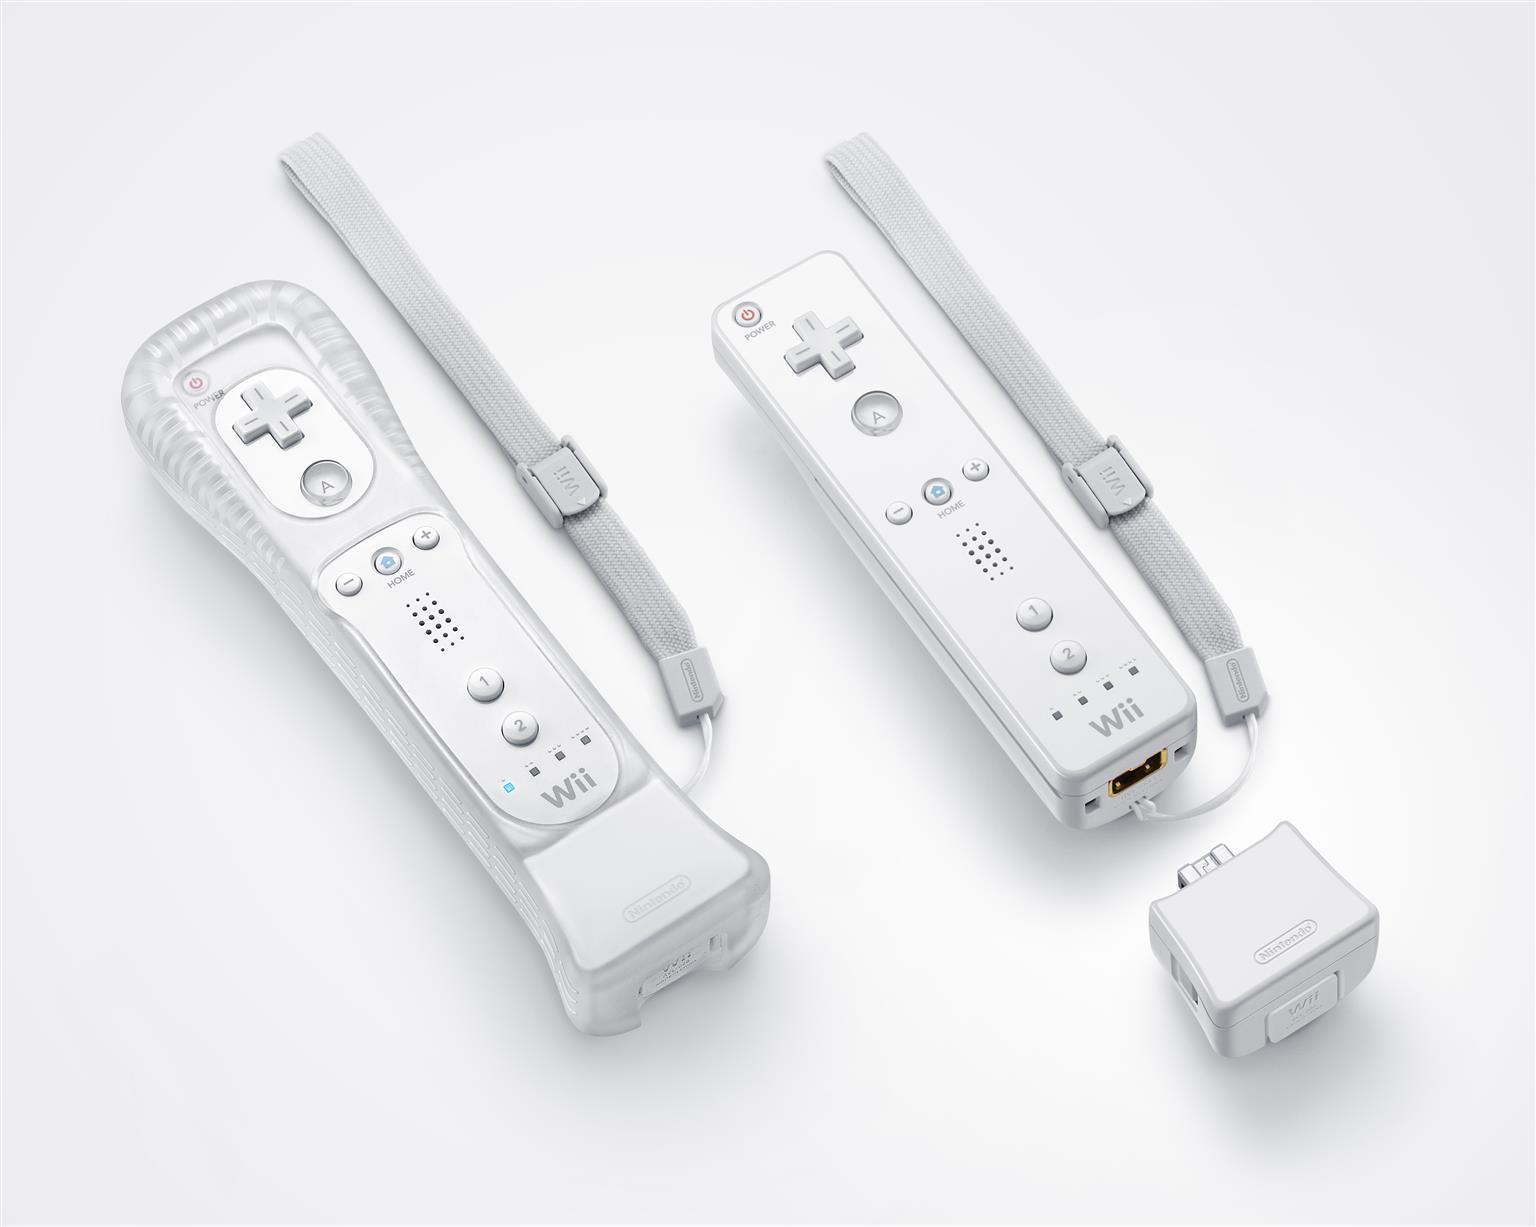 Nintendo Wii Console Bundle (incl. 2x Wii Remotes, 2x Nunchucks, 2x MotionPlus & 12x Games)